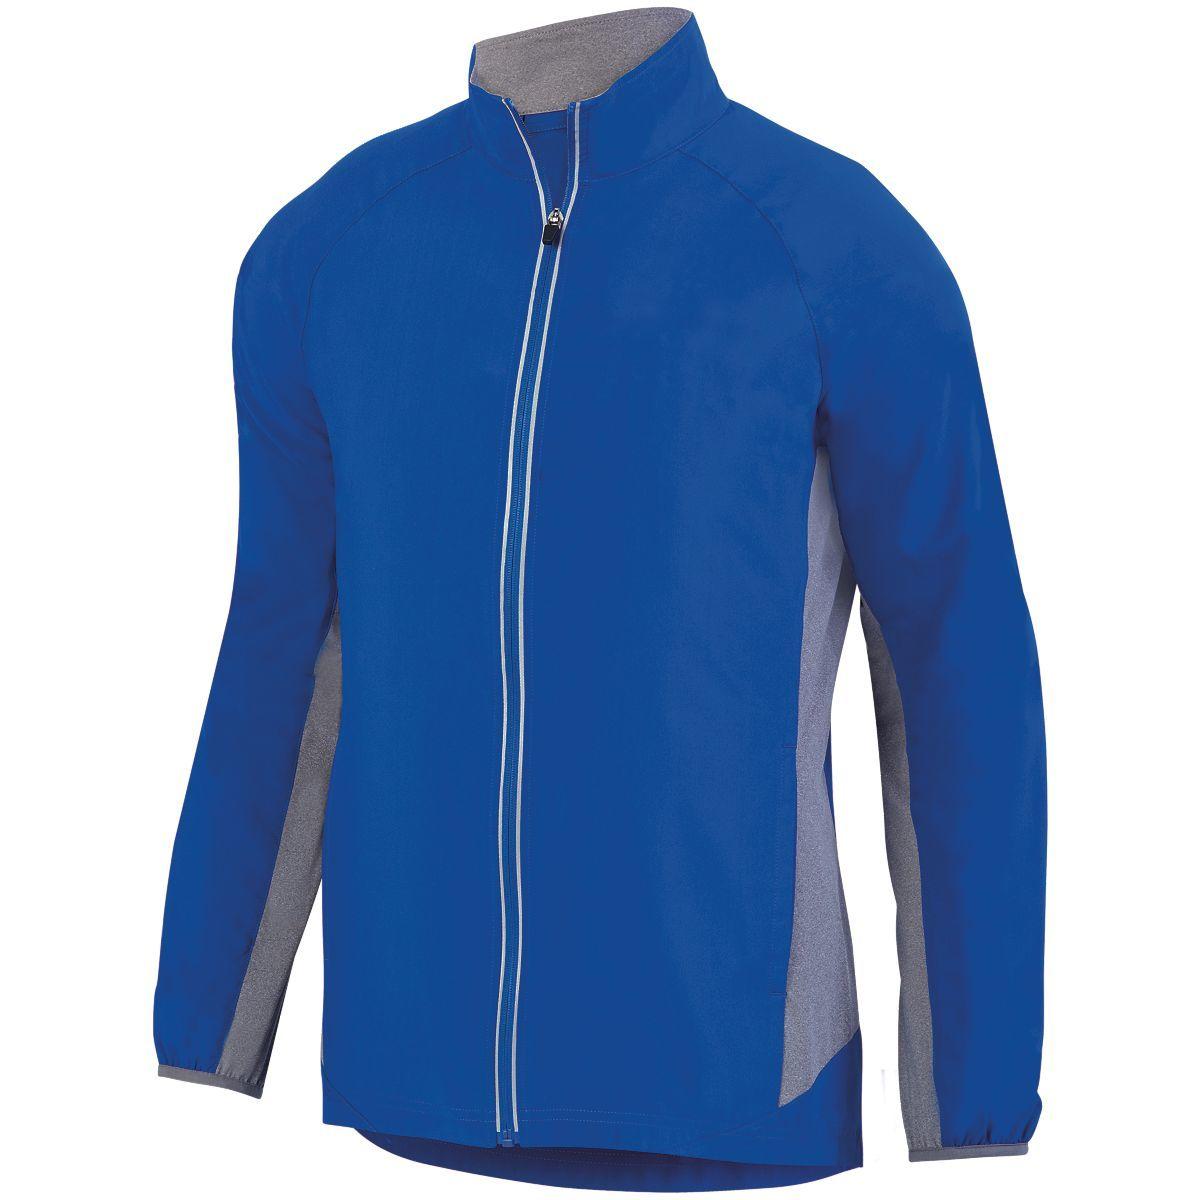 Preeminent Jacket - ROYAL/GRAPHITE HEATHER